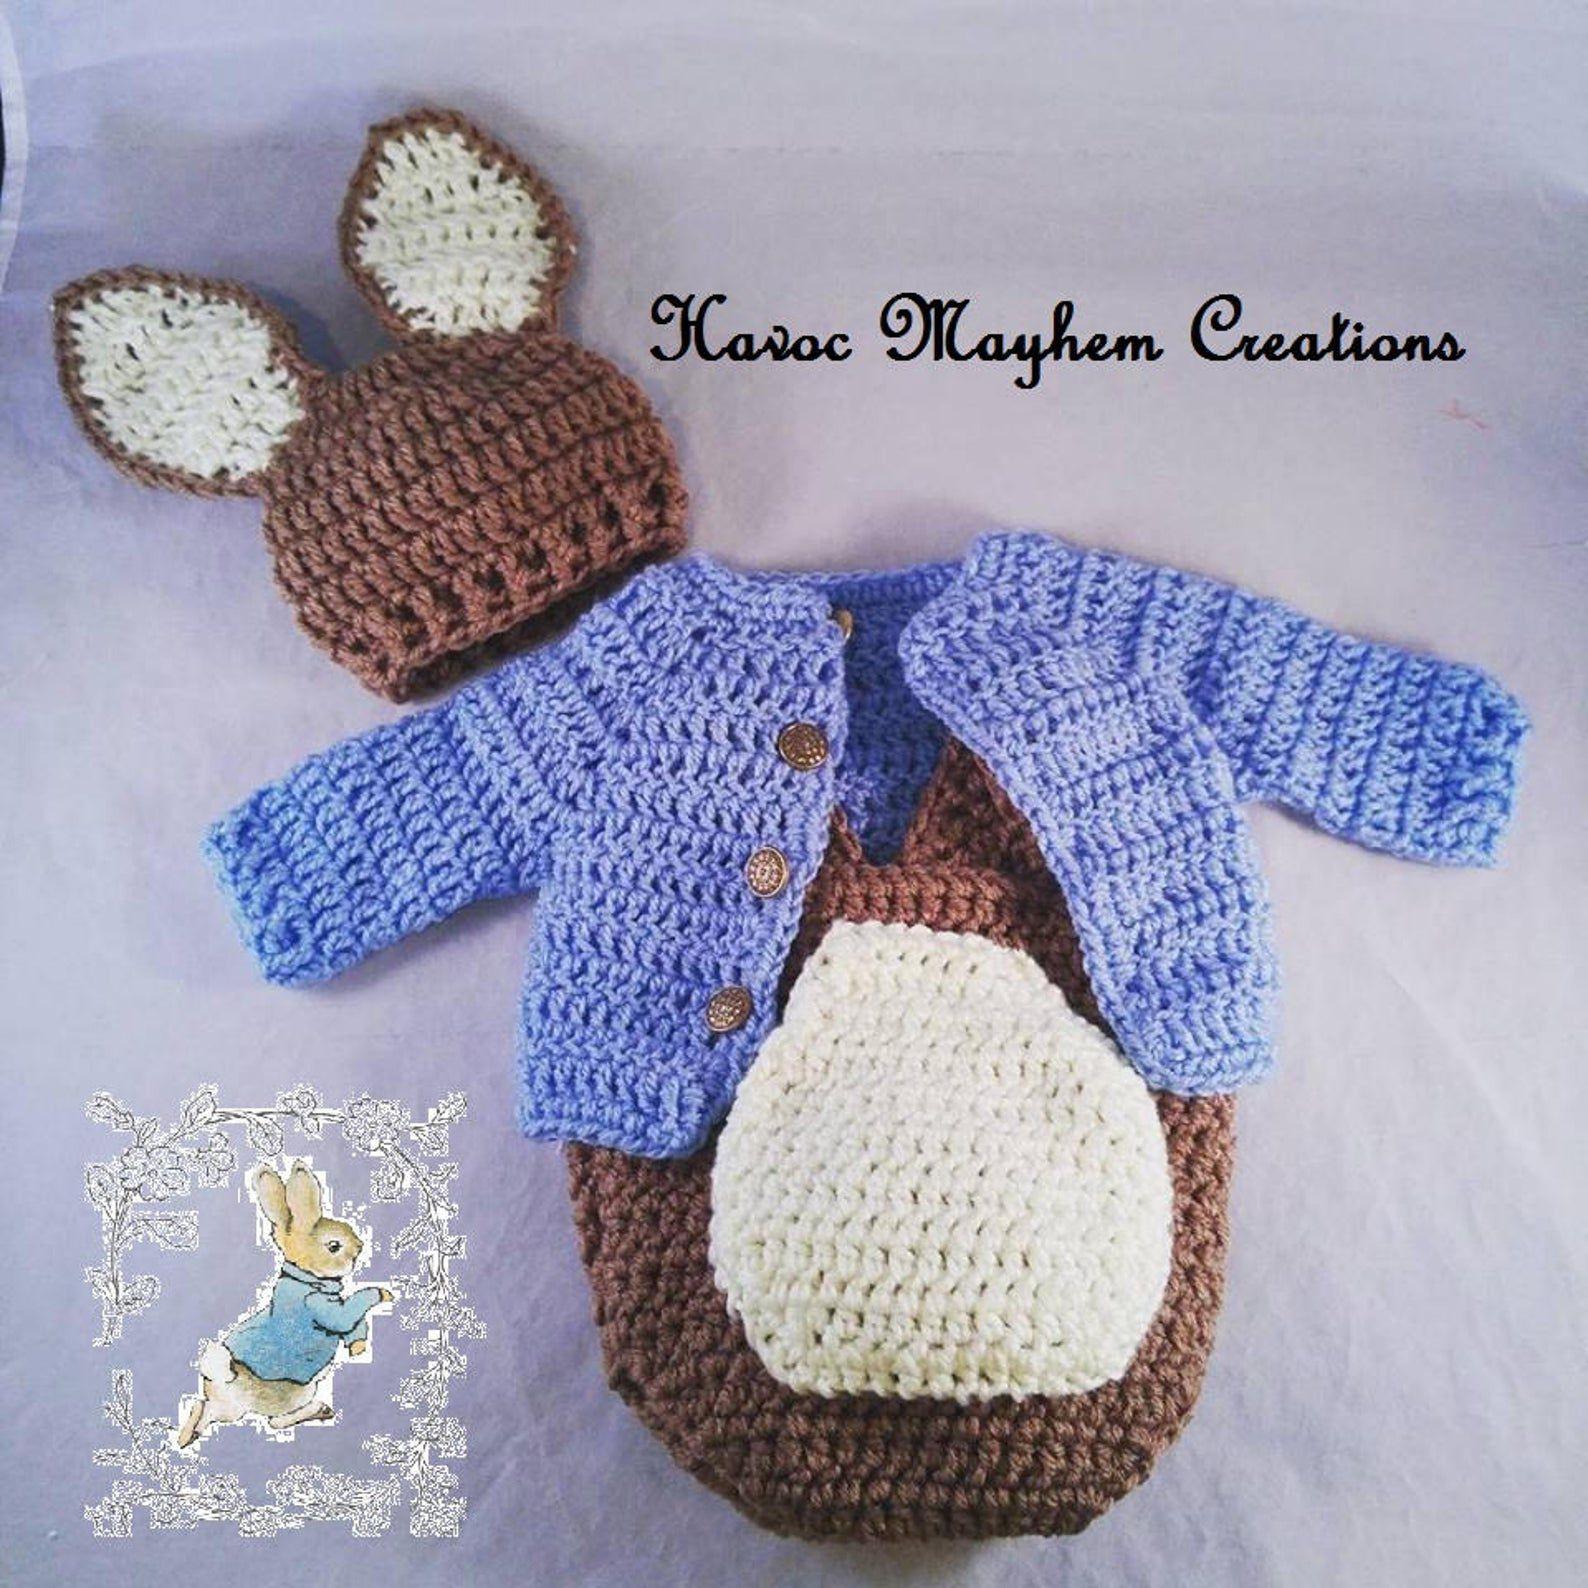 Crocheted Peter Rabbit costume.